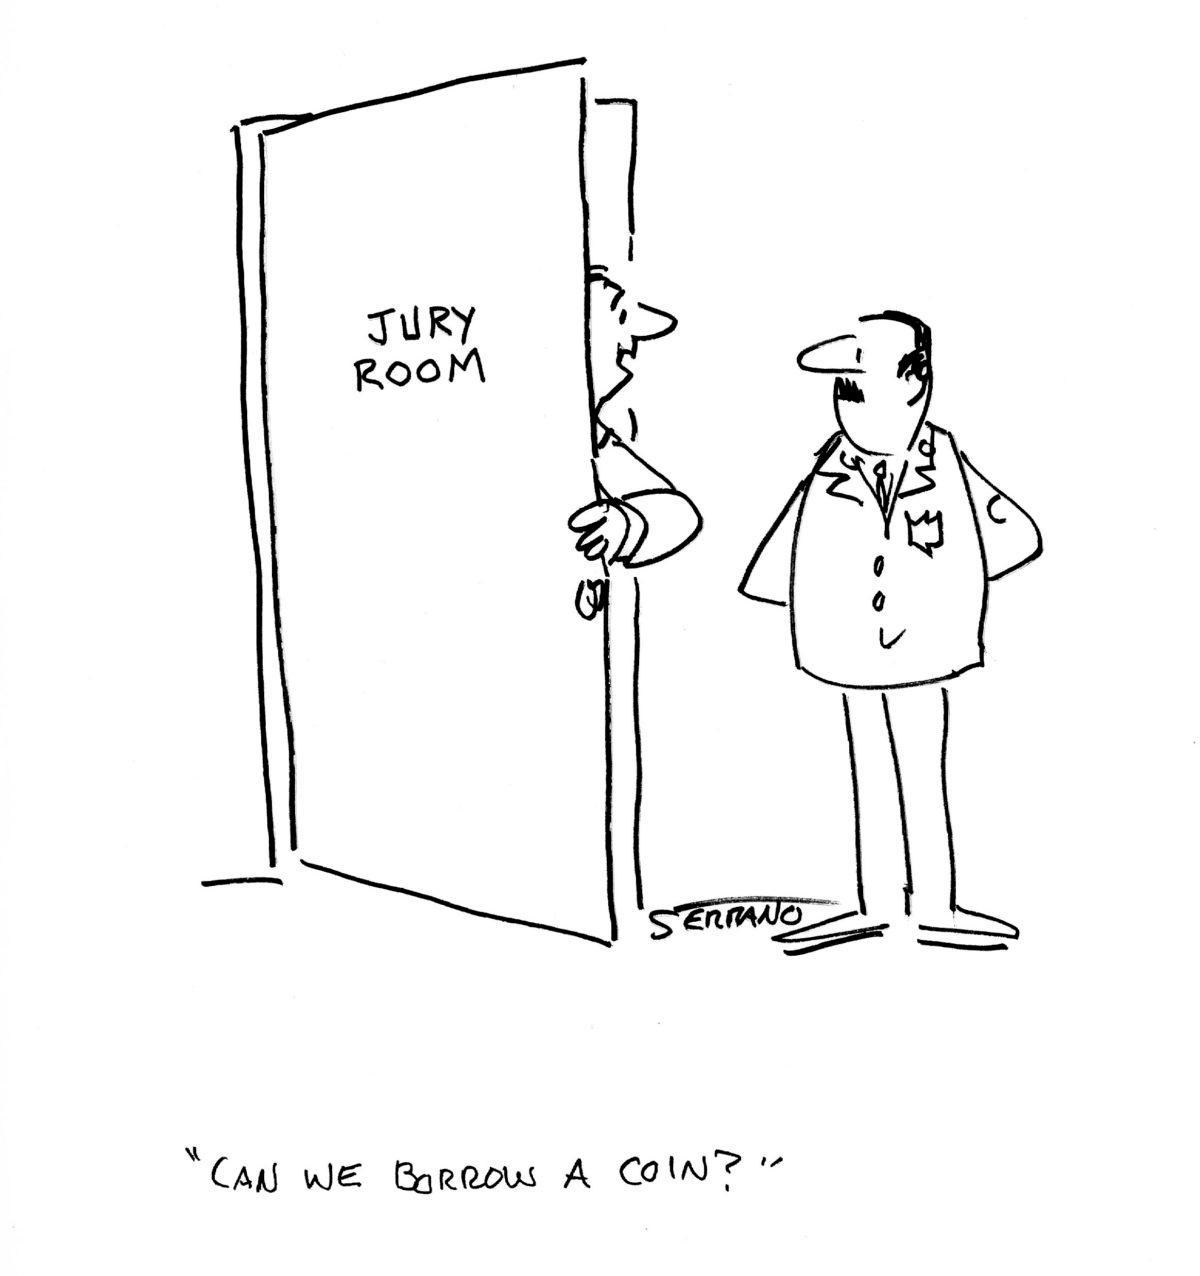 02 Jury Room Coin 001